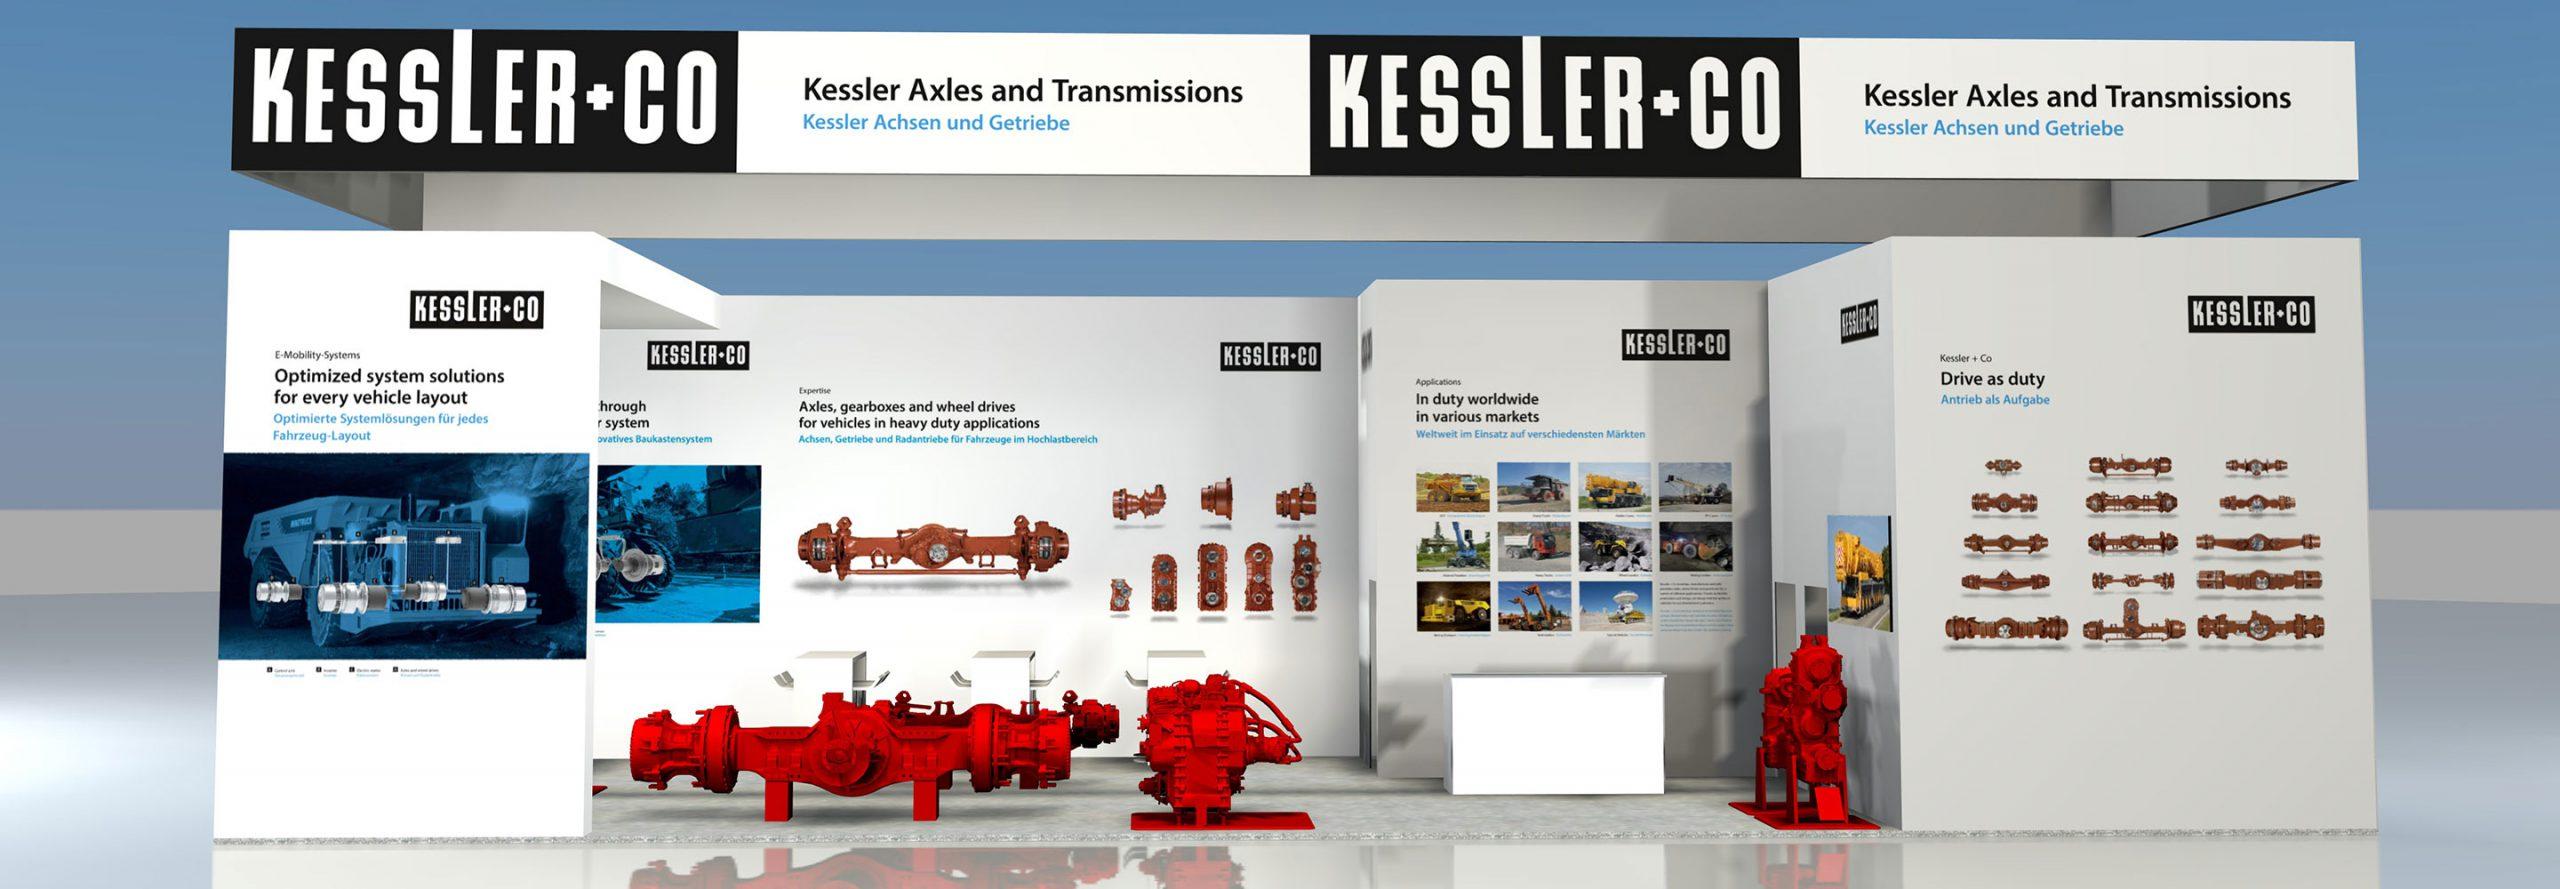 Header_News_Kessler_bauma_2880x1000_web